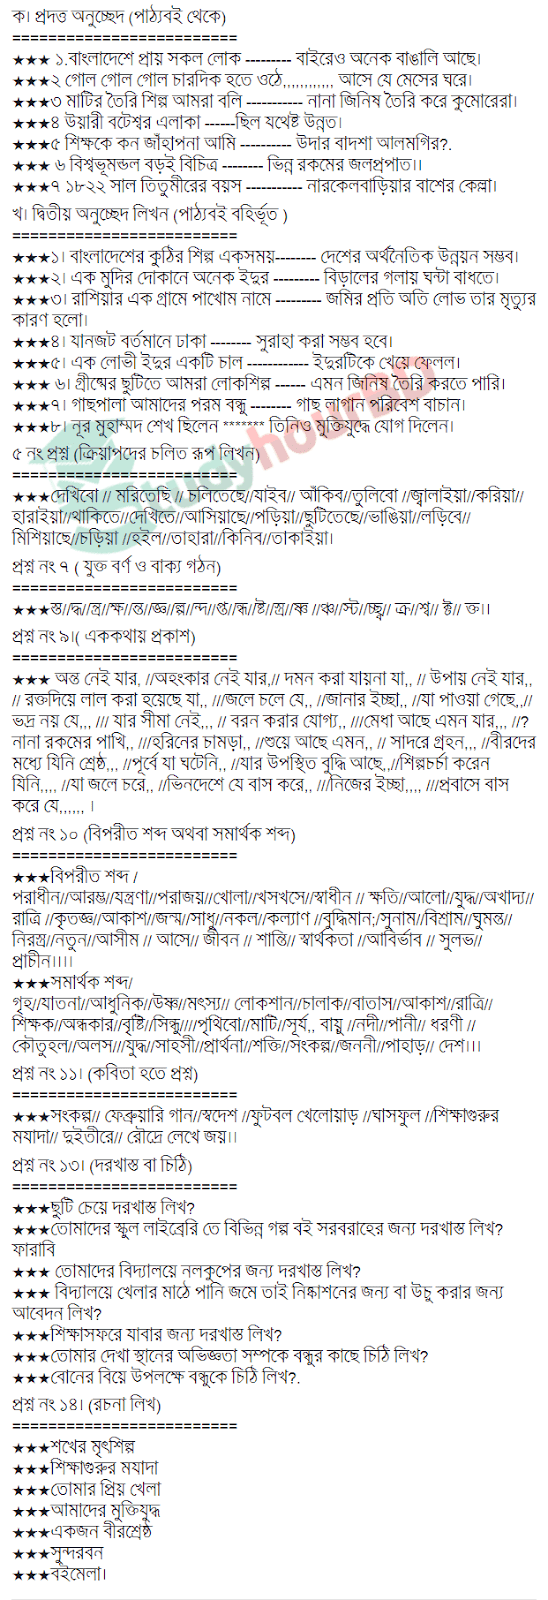 PSC Bangla Suggestion 2019 part 1